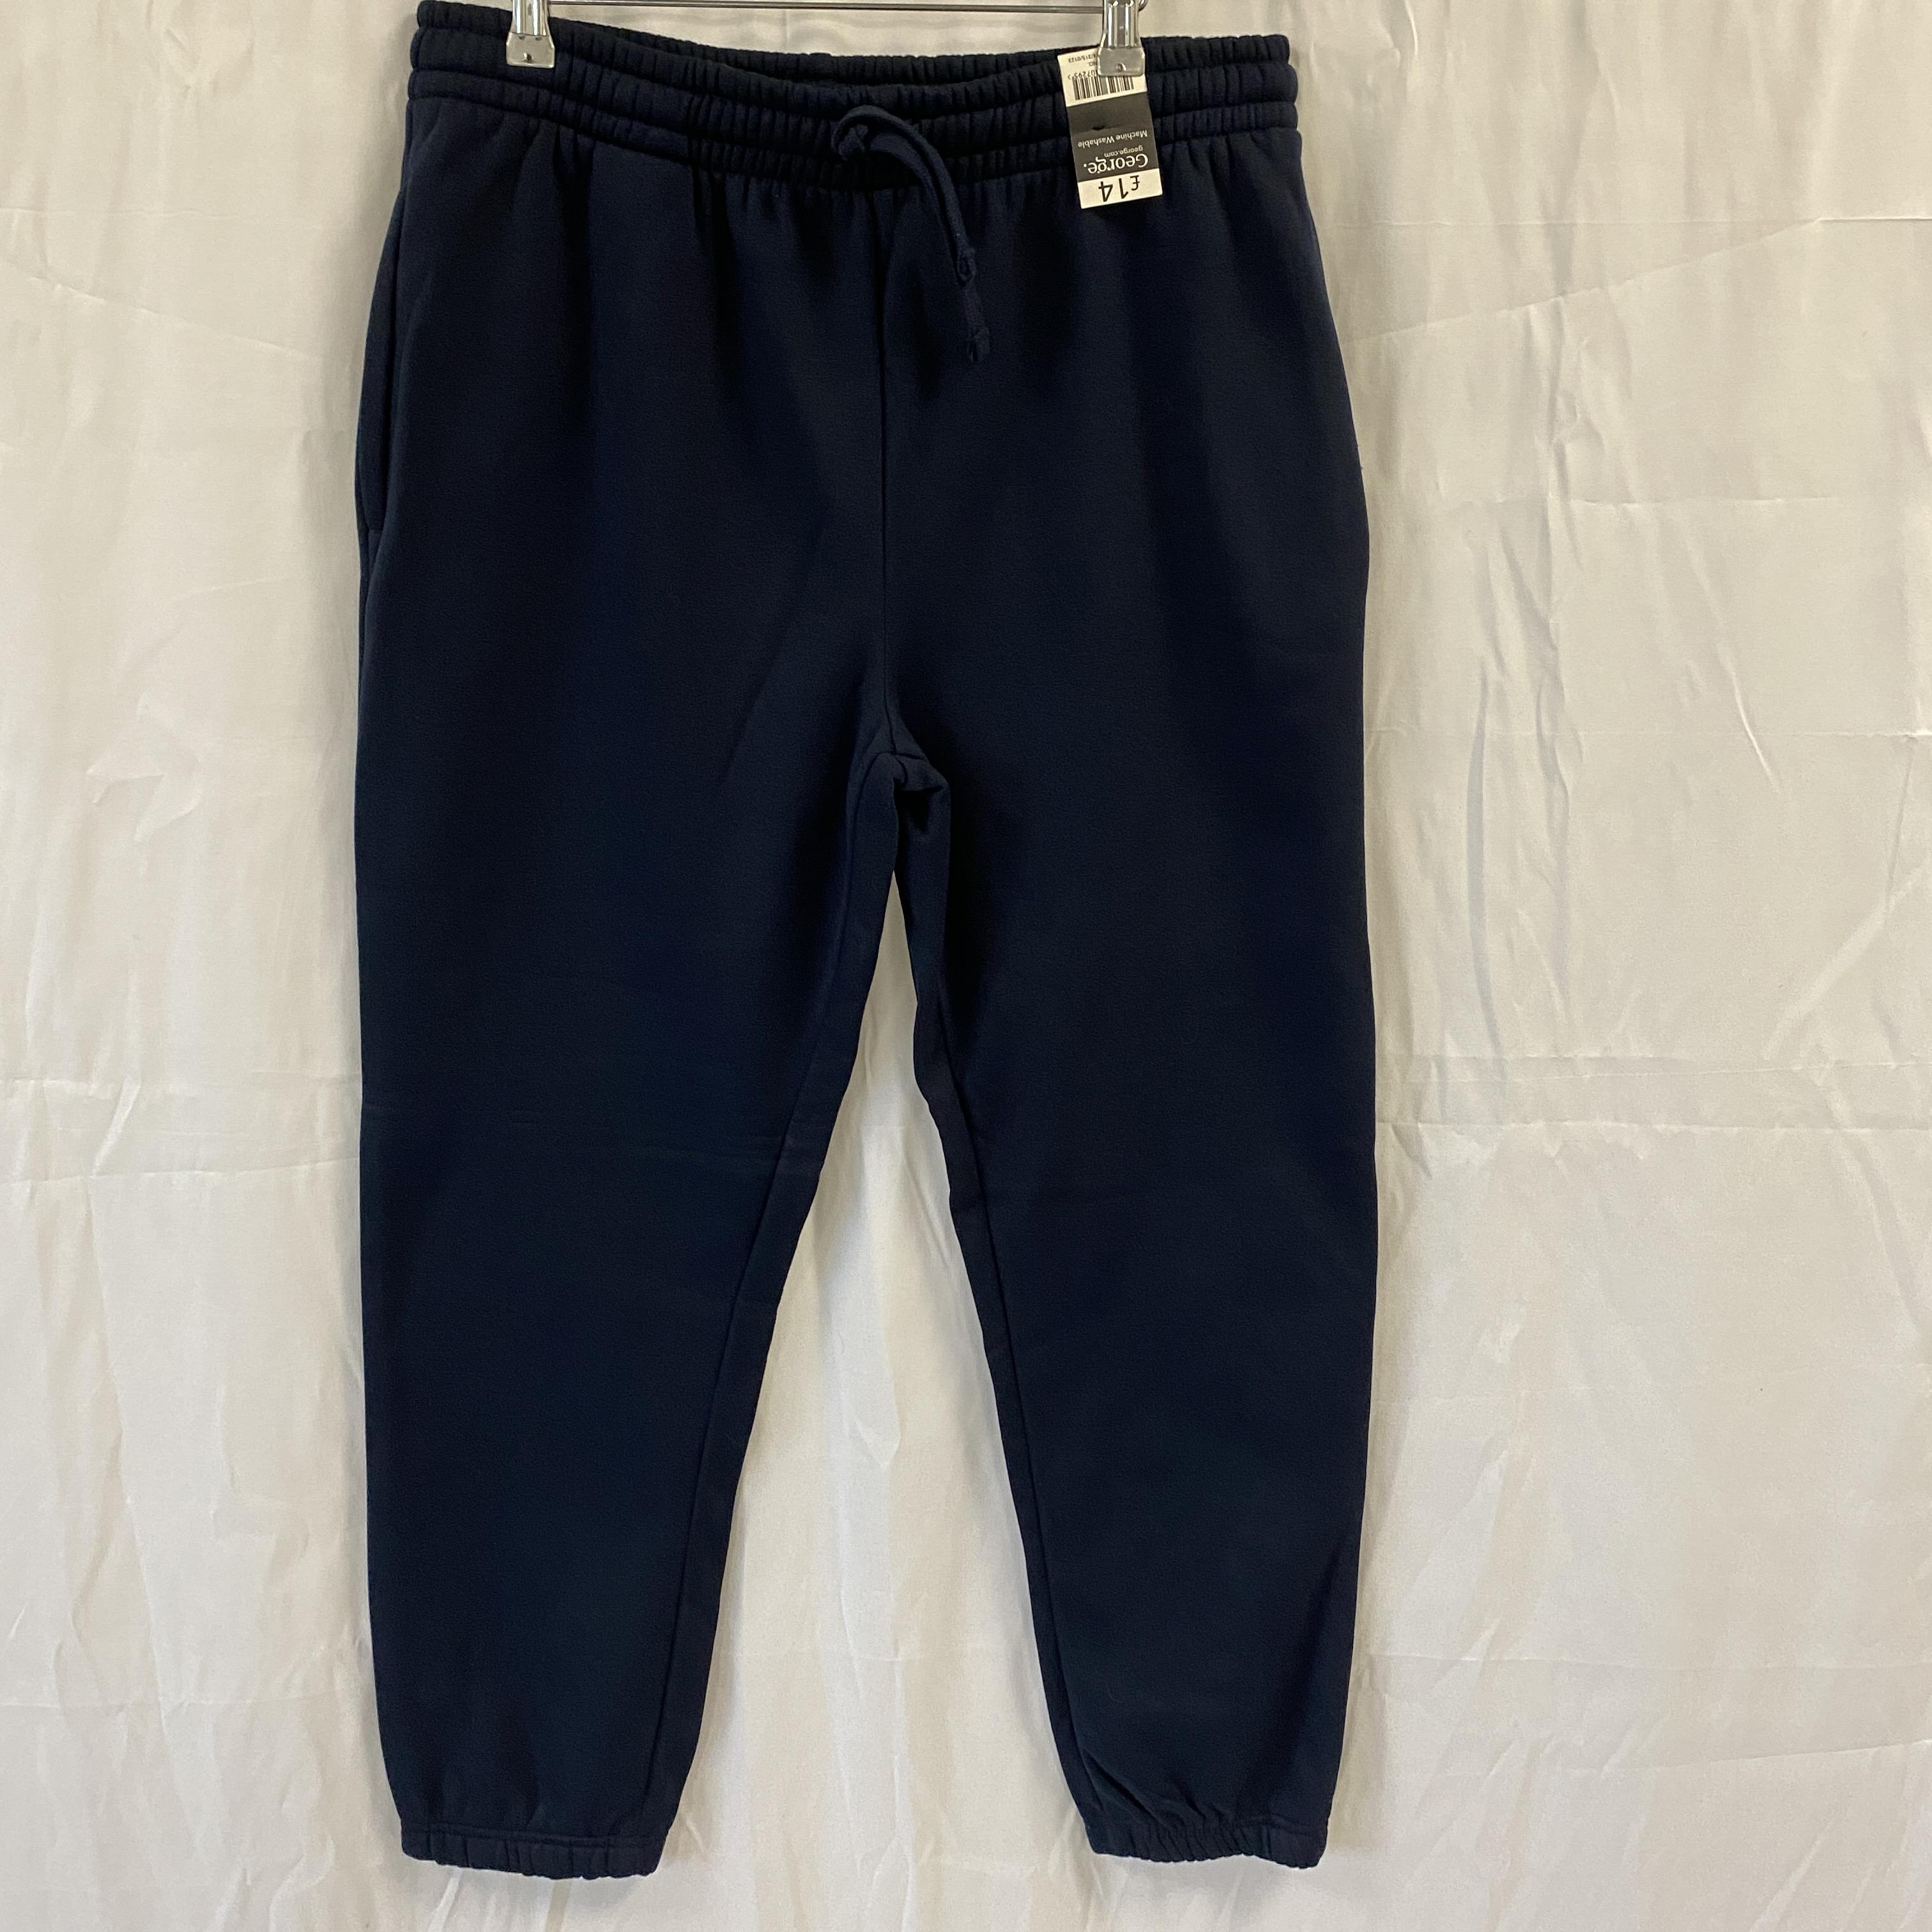 Brand New Navy Jogging Bottoms - Size L